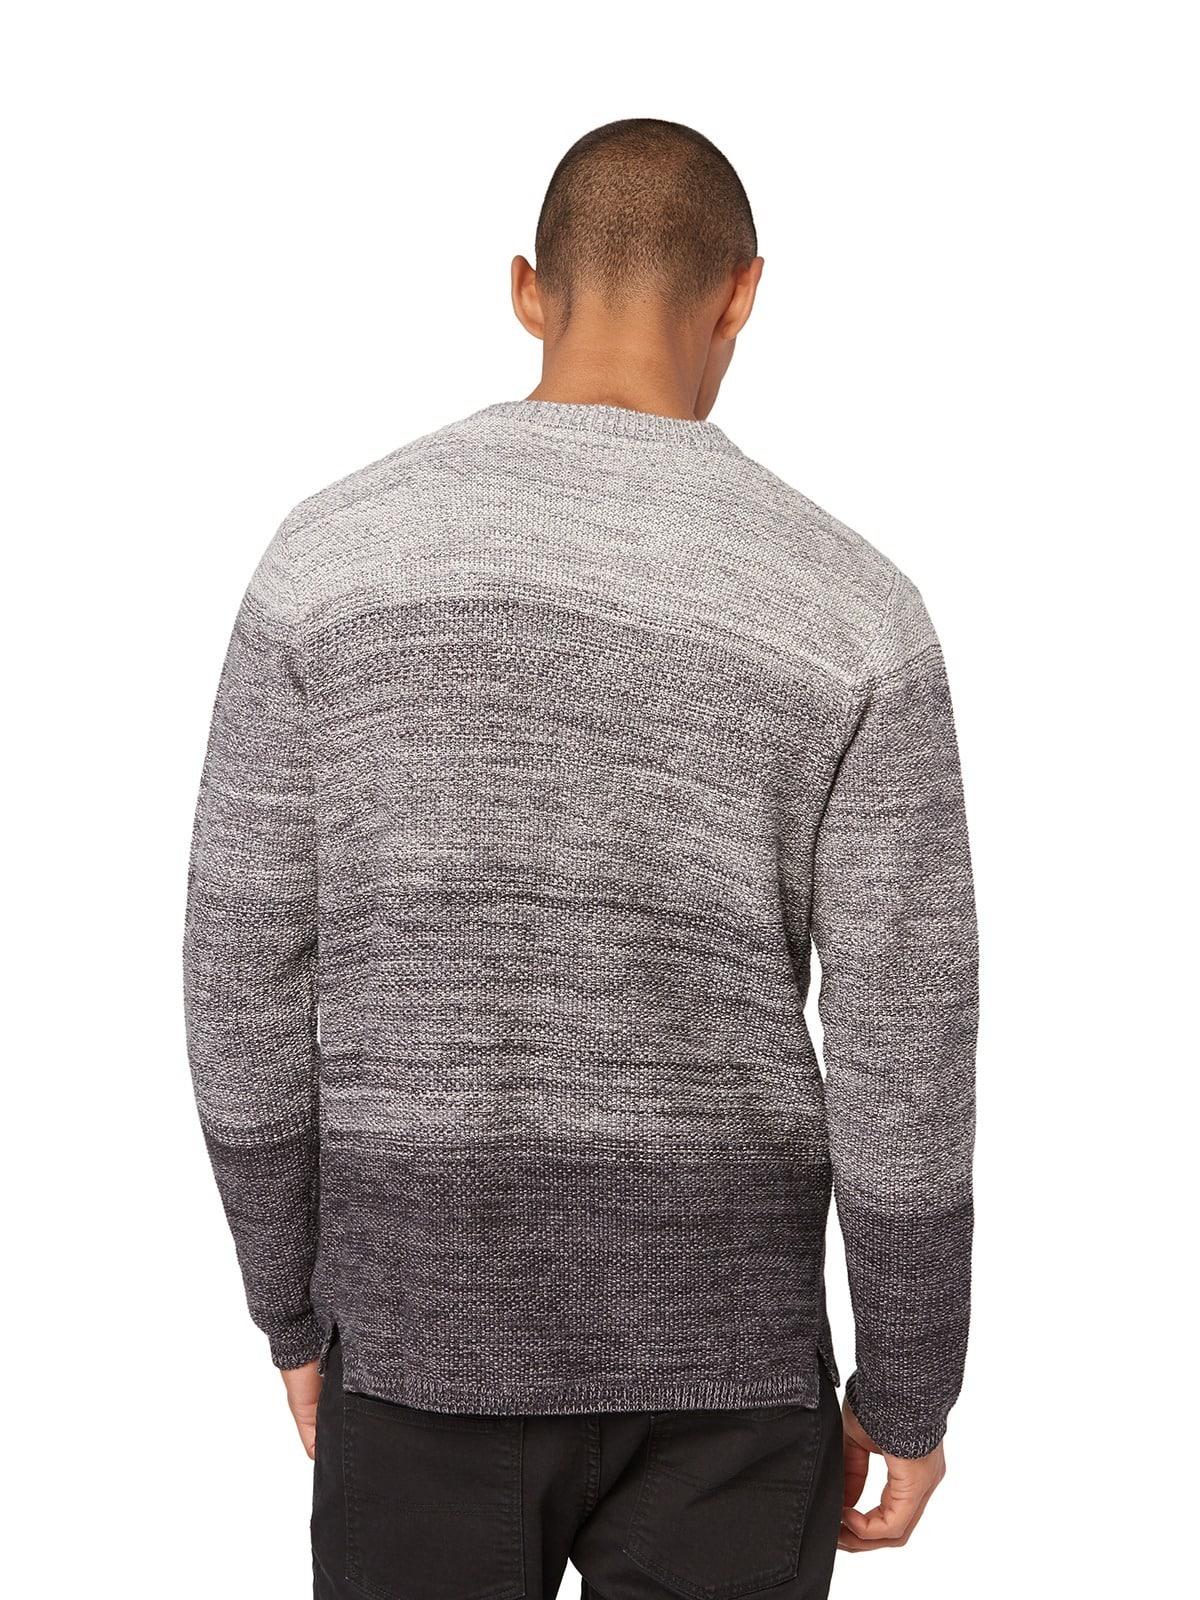 Frank oak gradient cardigan in grey in gray for men lyst for Frank and oak shirt